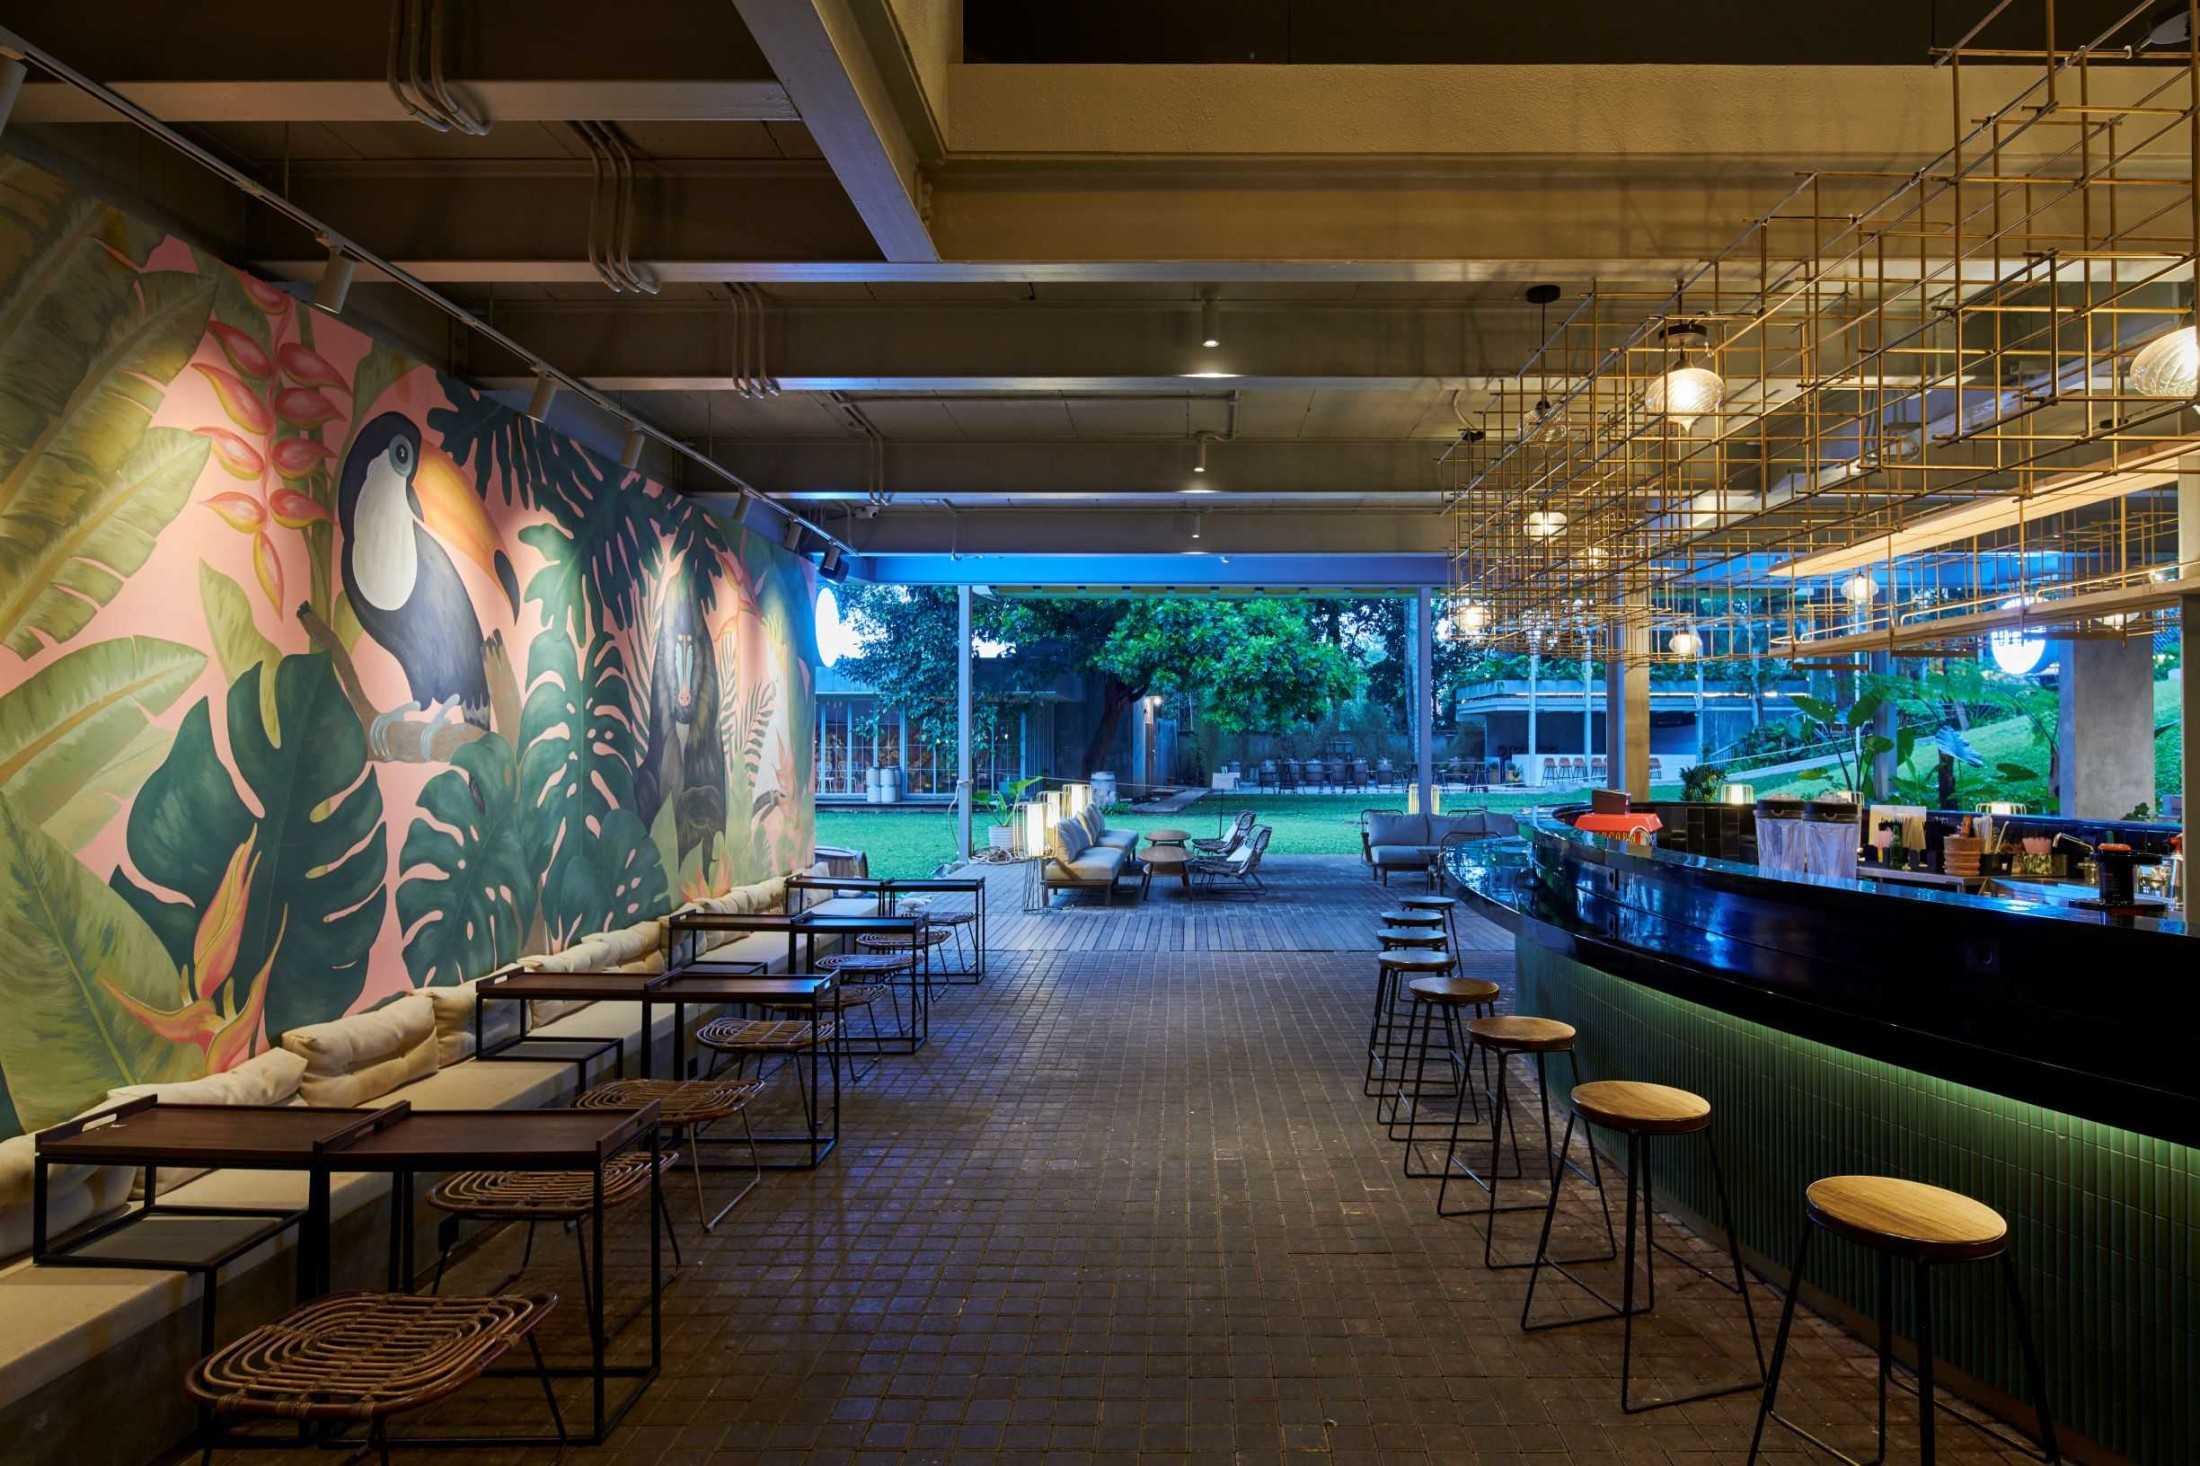 Hadivincent Architects Oval Bar Ciumbuleuit, Cidadap, Kota Bandung, Jawa Barat, Indonesia Ciumbuleuit, Cidadap, Kota Bandung, Jawa Barat, Indonesia Hadivincent-Architects-Oval-Bar  71527